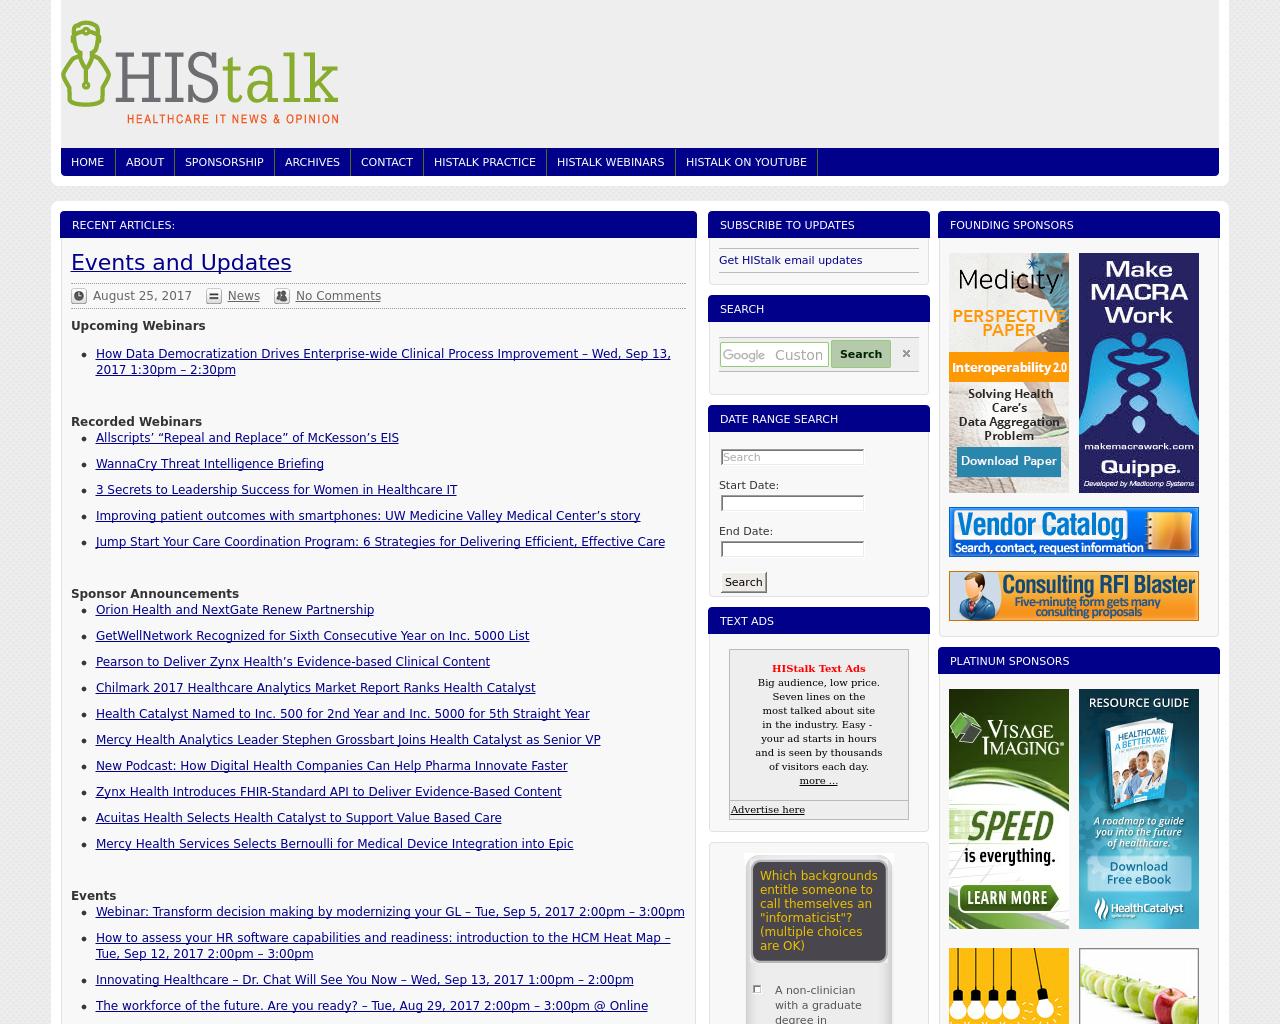 Histalk-2-Advertising-Reviews-Pricing